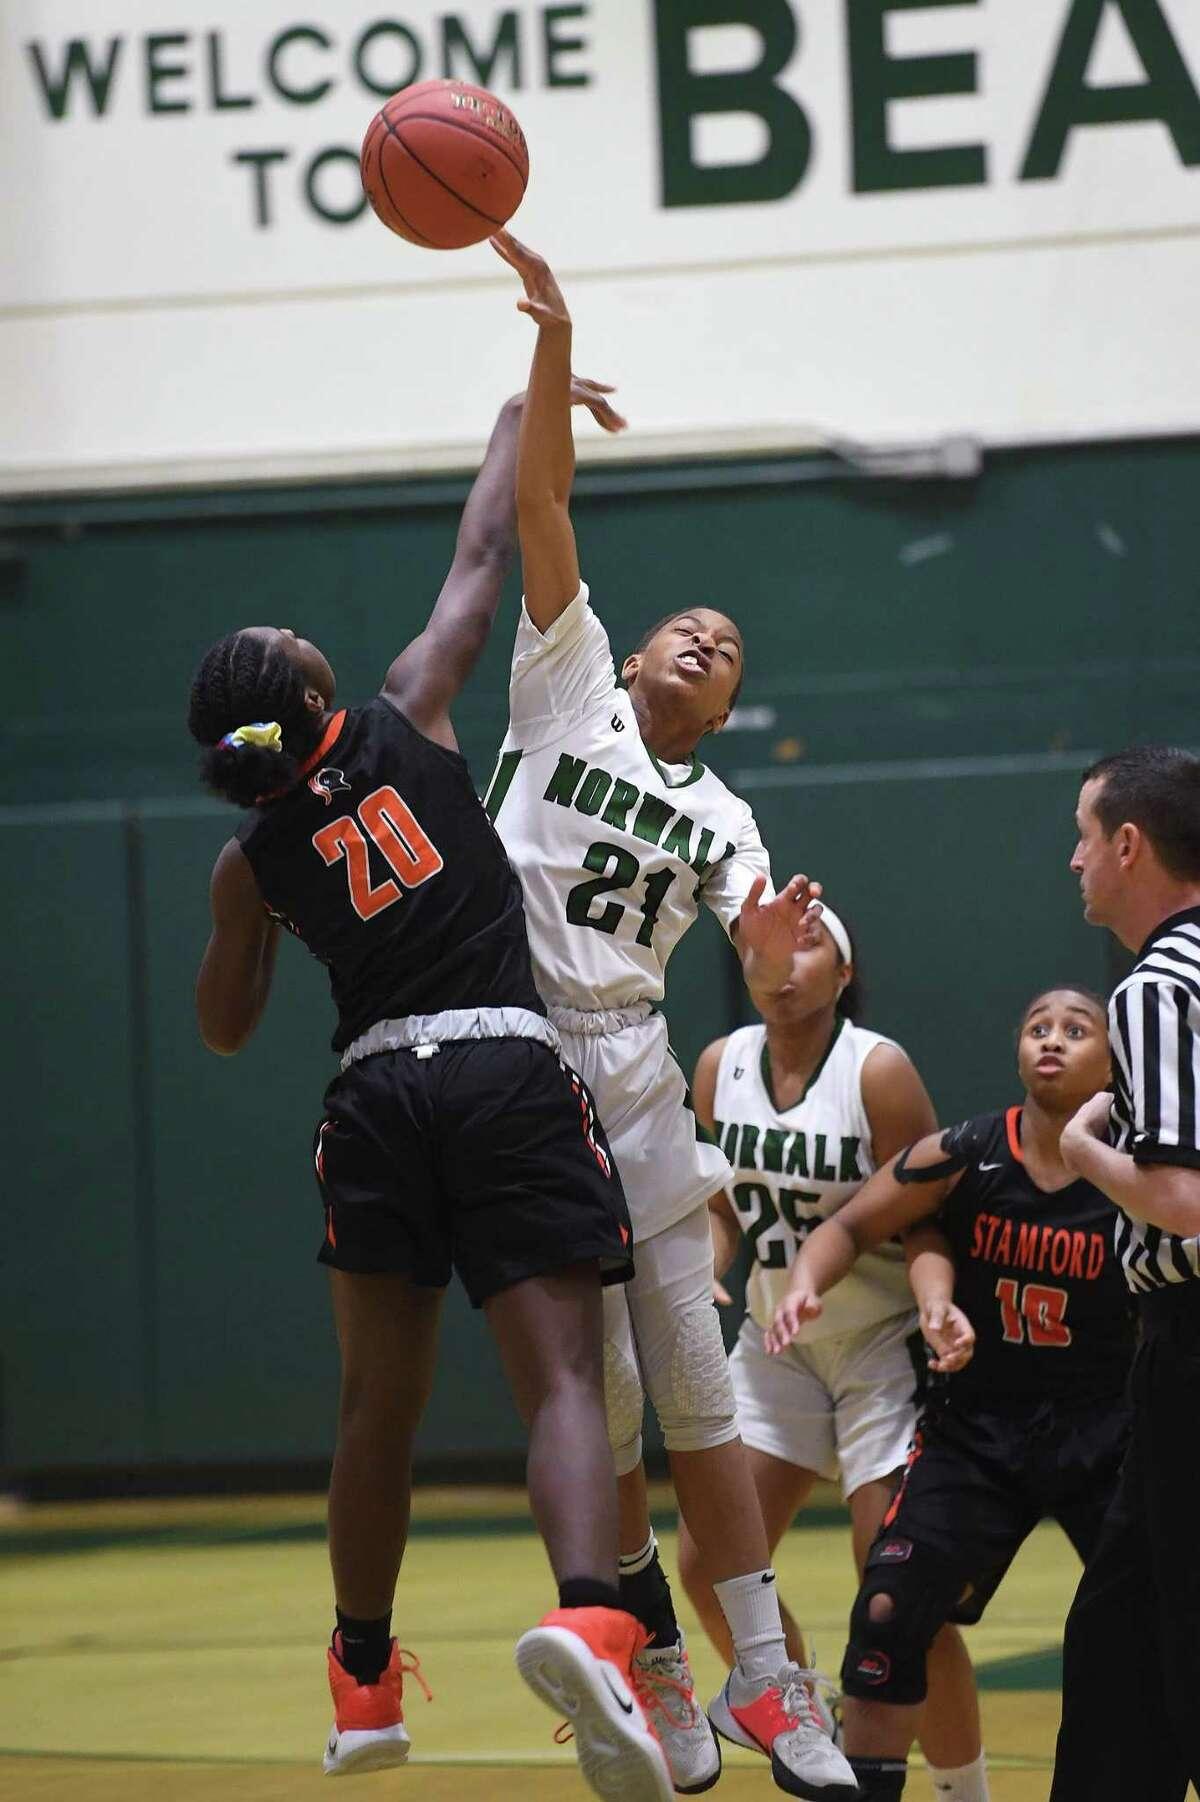 Norwalk defeats Stamford in girls basketball at Norwalk High School in Norwalk, Conn. on Monday, February10, 2020.